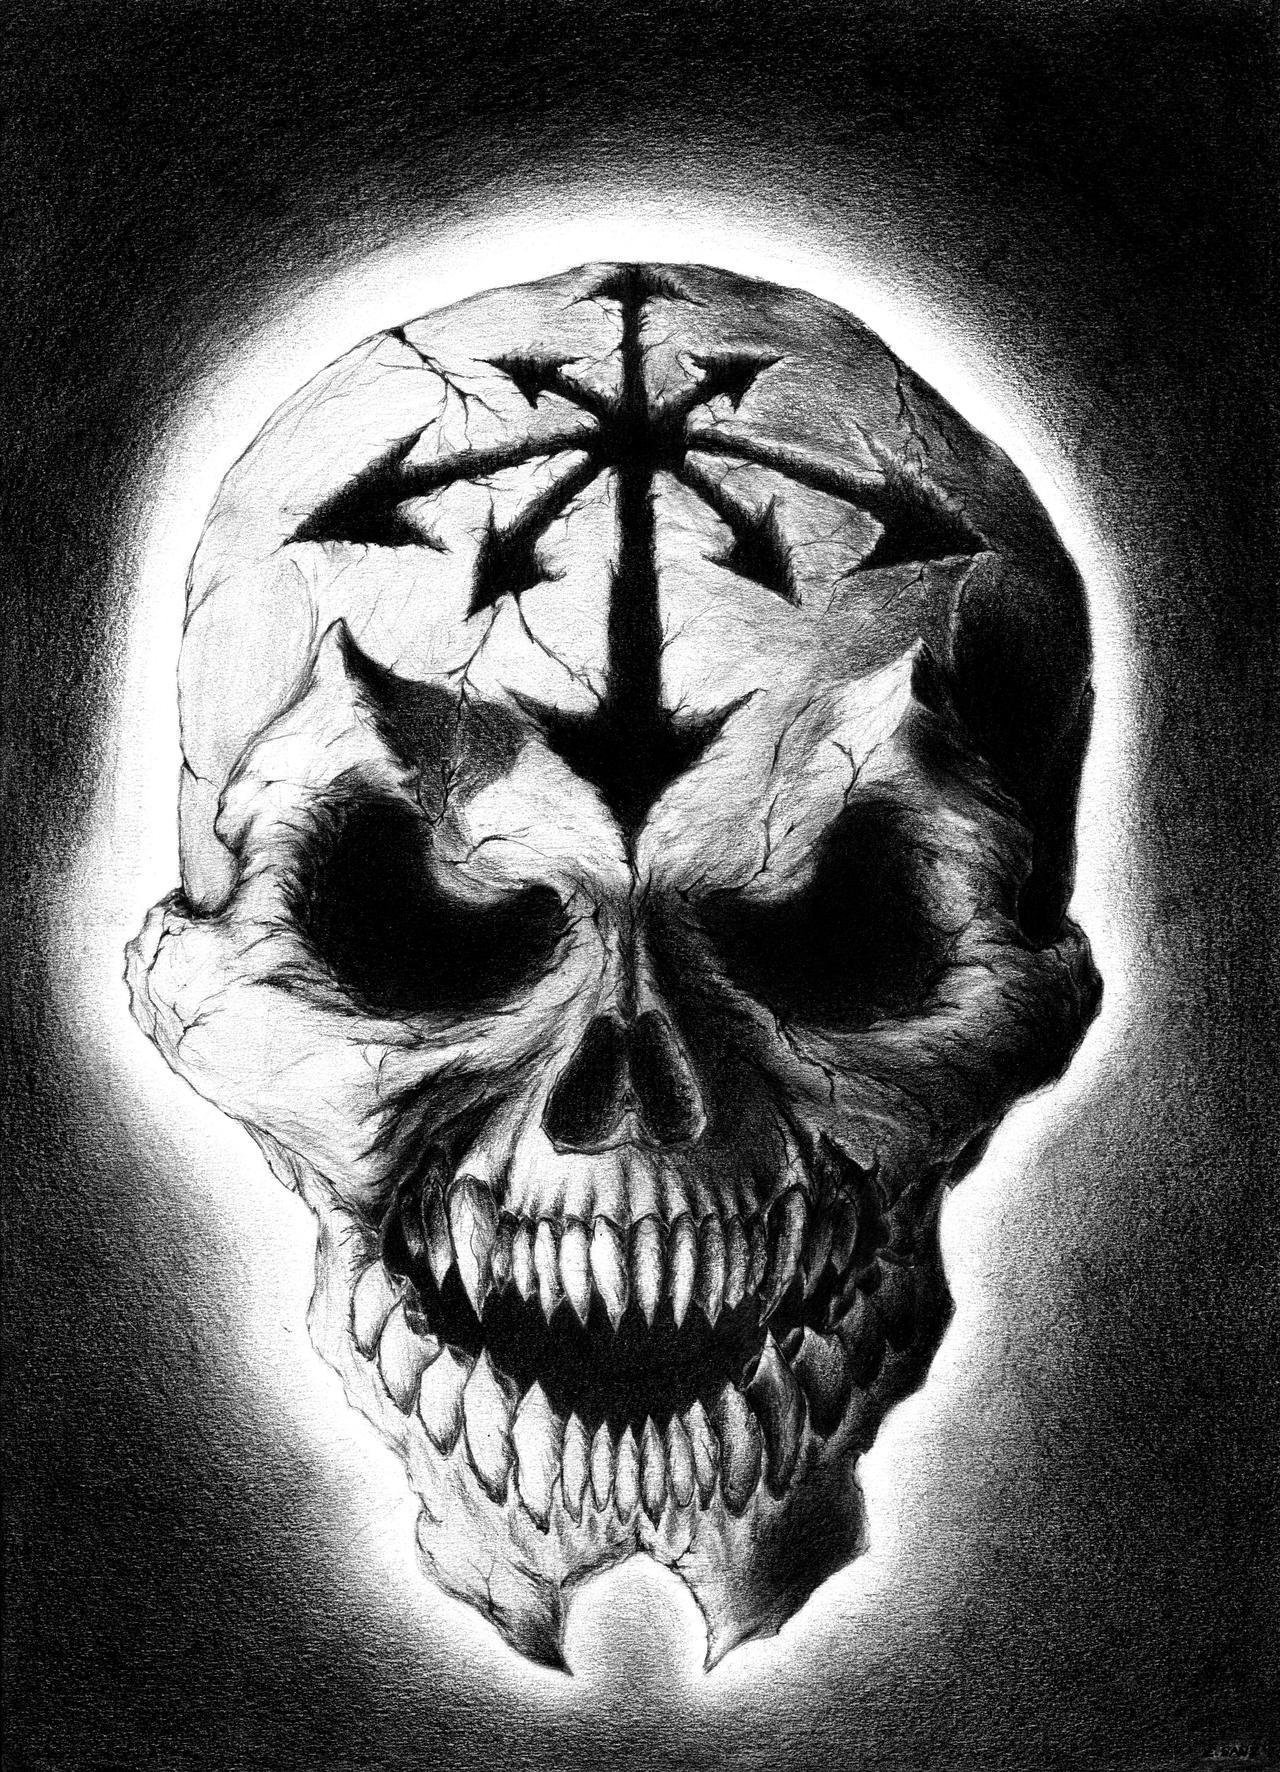 Chaos skull by kutxo on DeviantArt